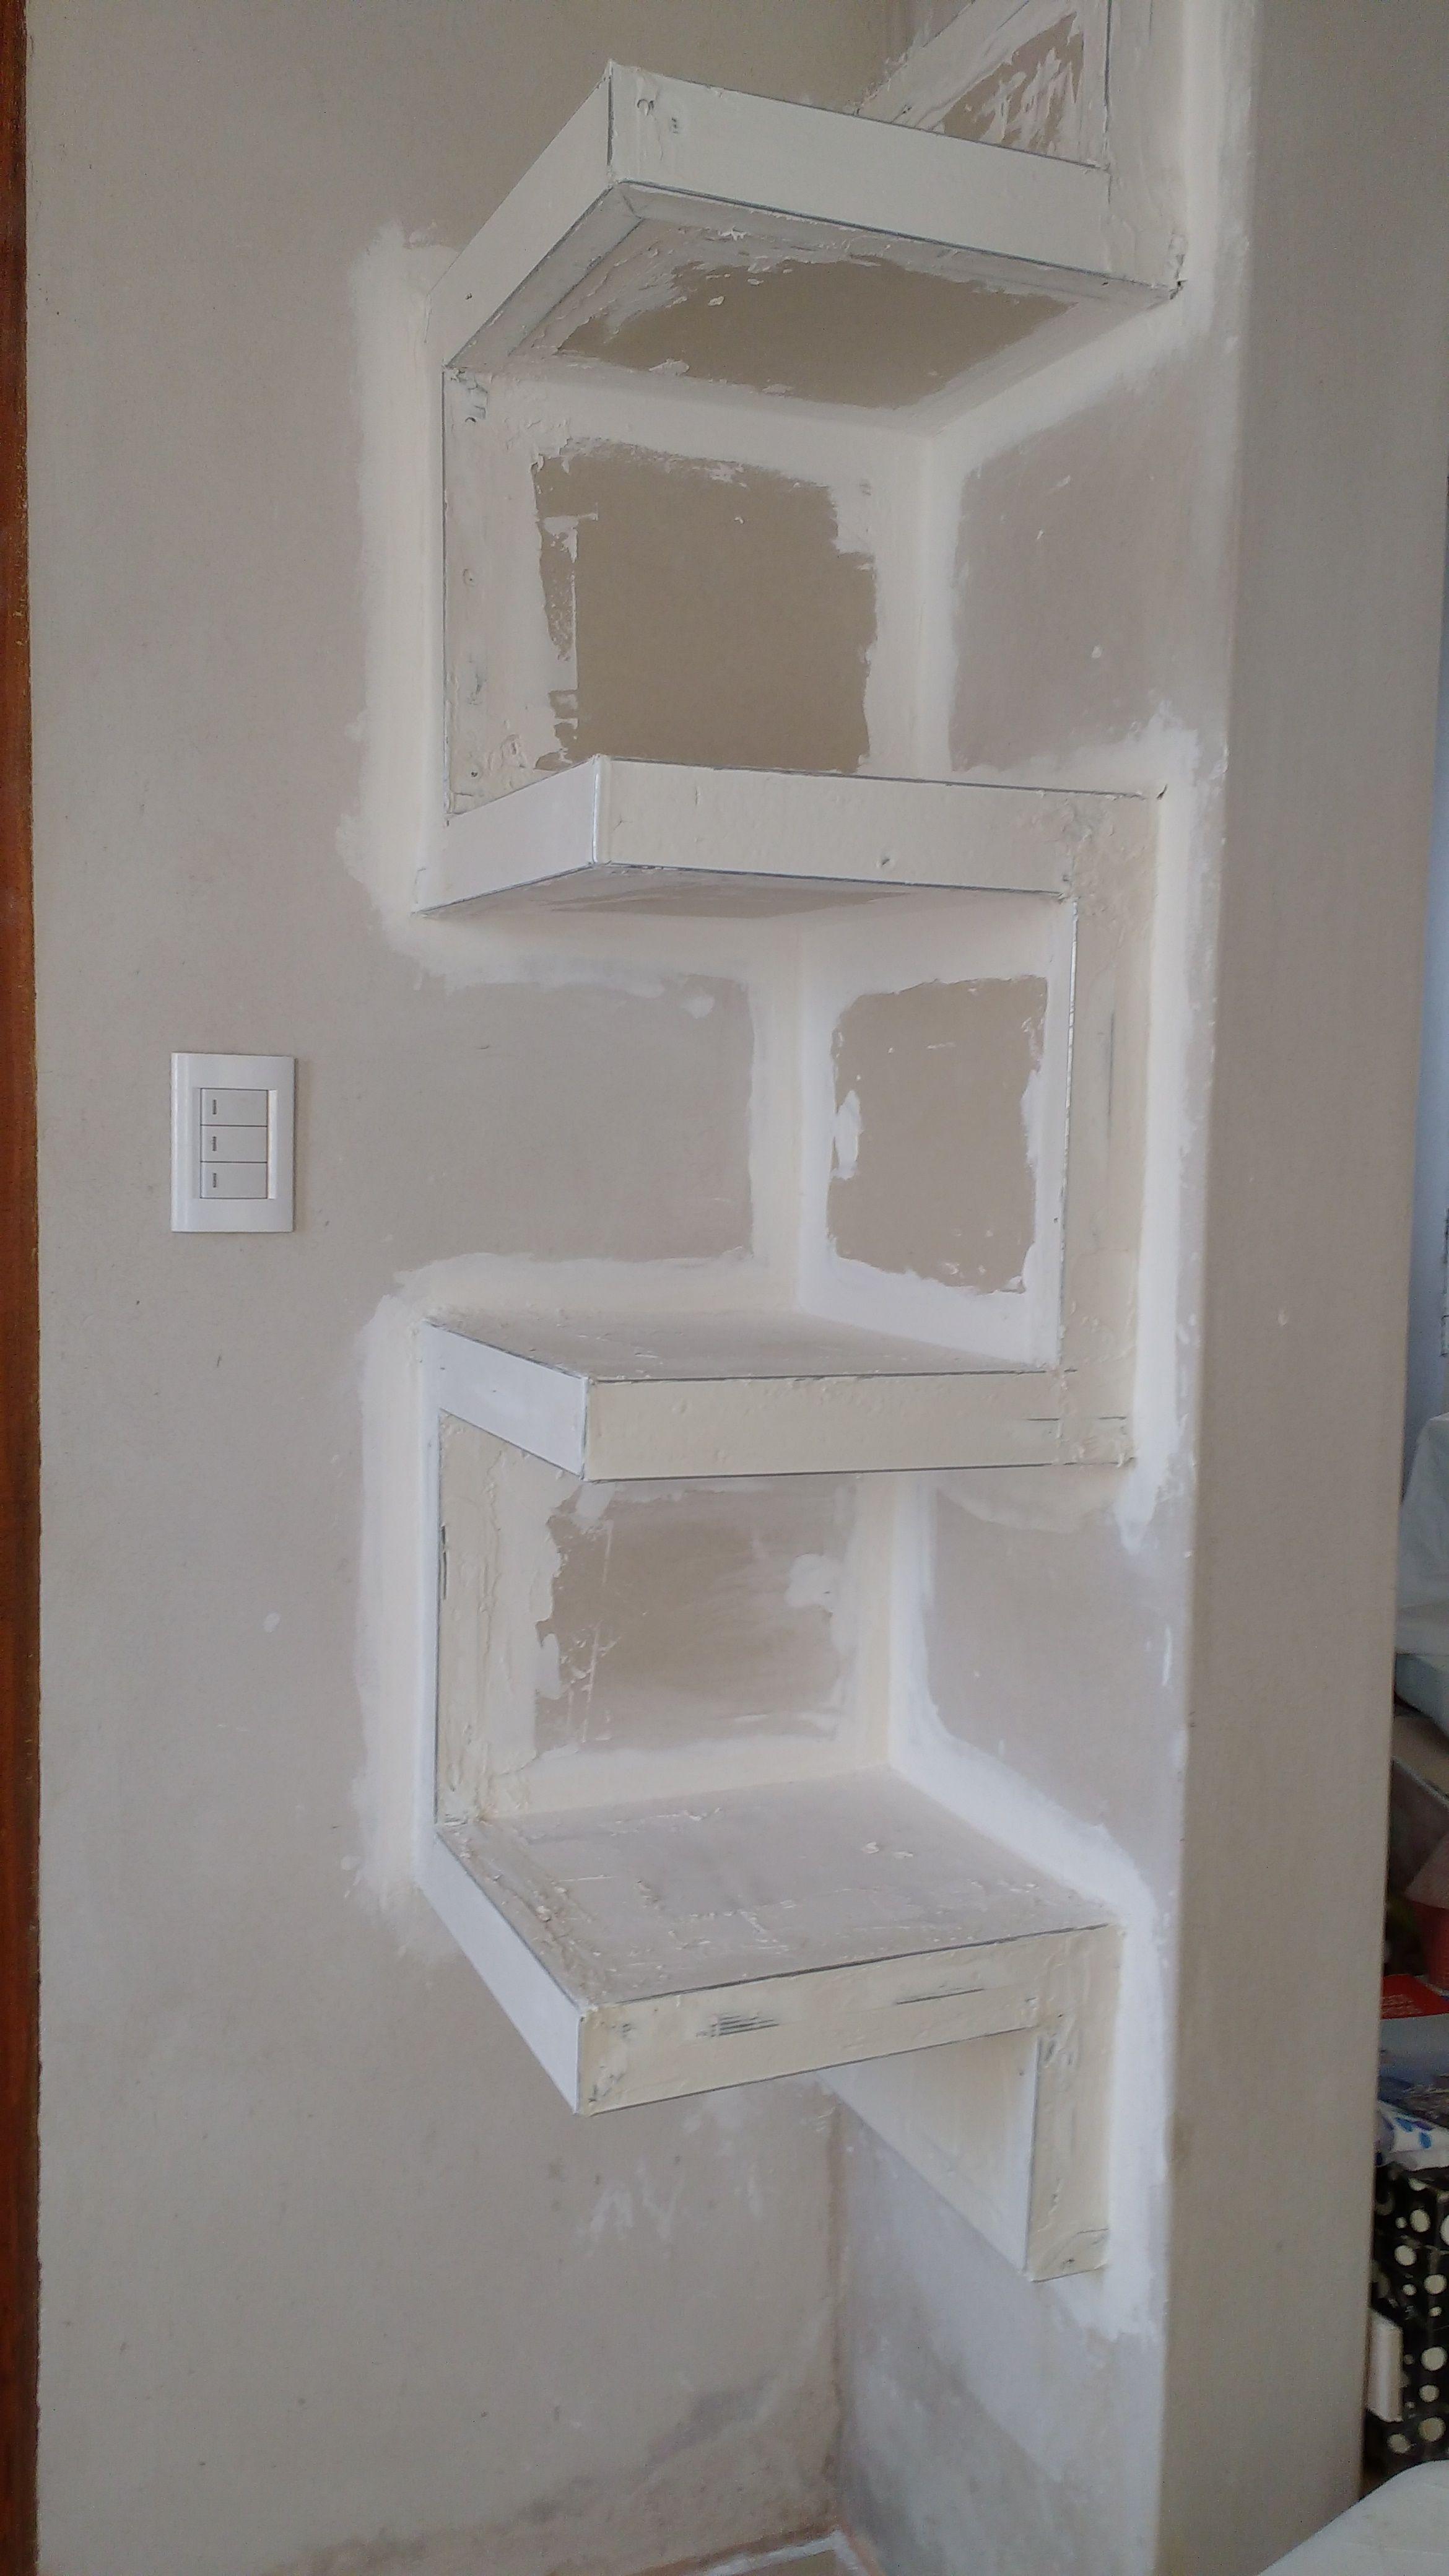 Mueble de durlock mueble repisa de durlock pinterest for Mueble y decoracion